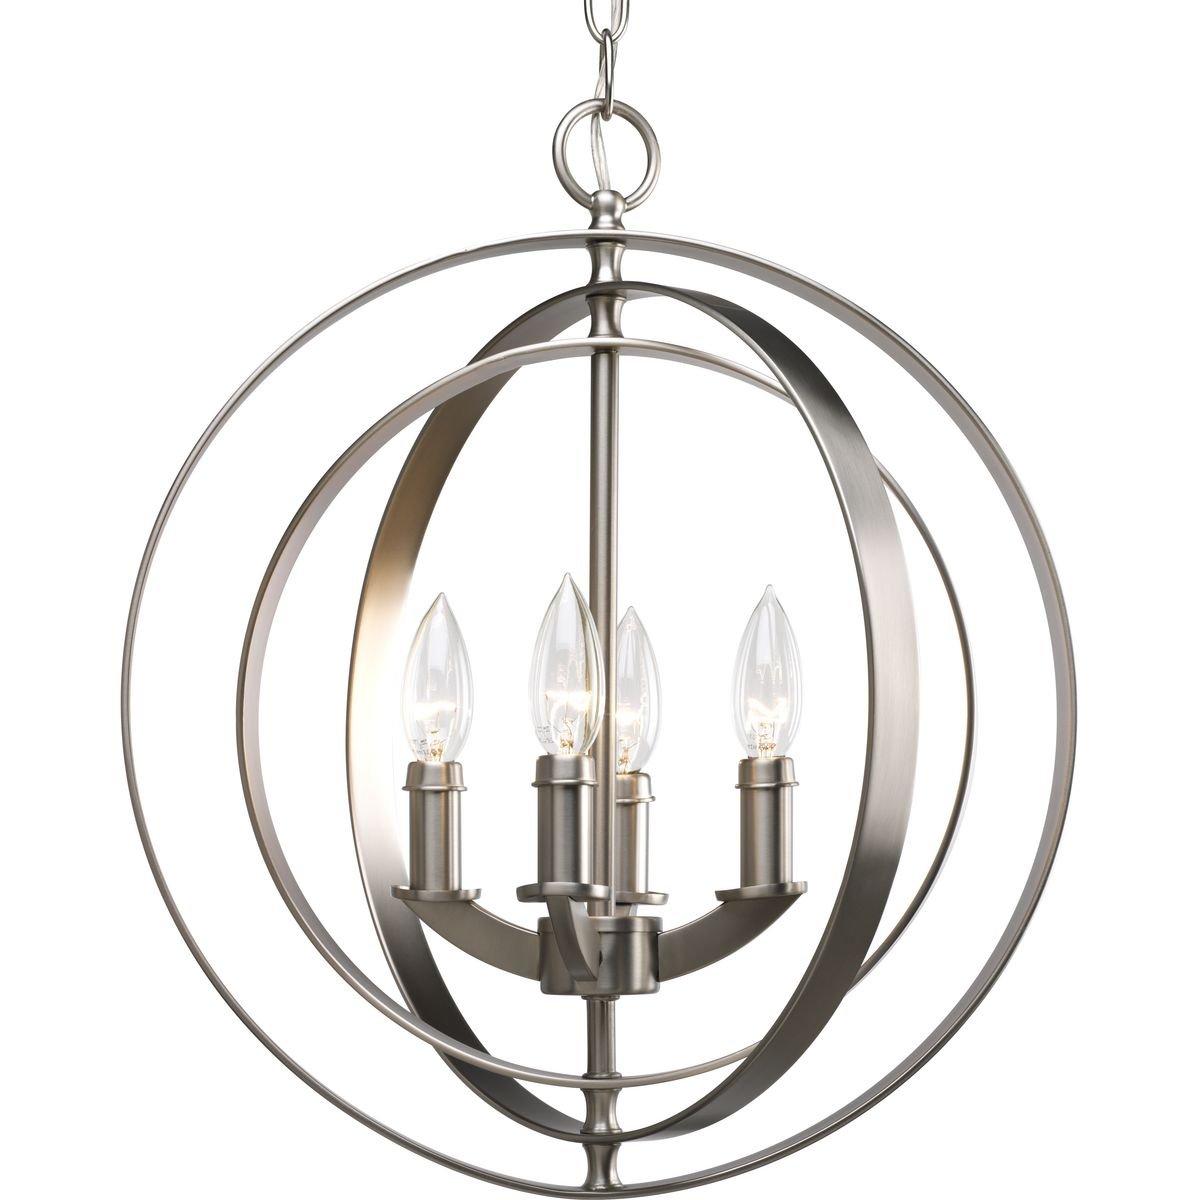 Progress Lighting P3827-126 4-Light Sphere Foyer Lantern with Pivoting Interlocking Rings, Burnished Silver